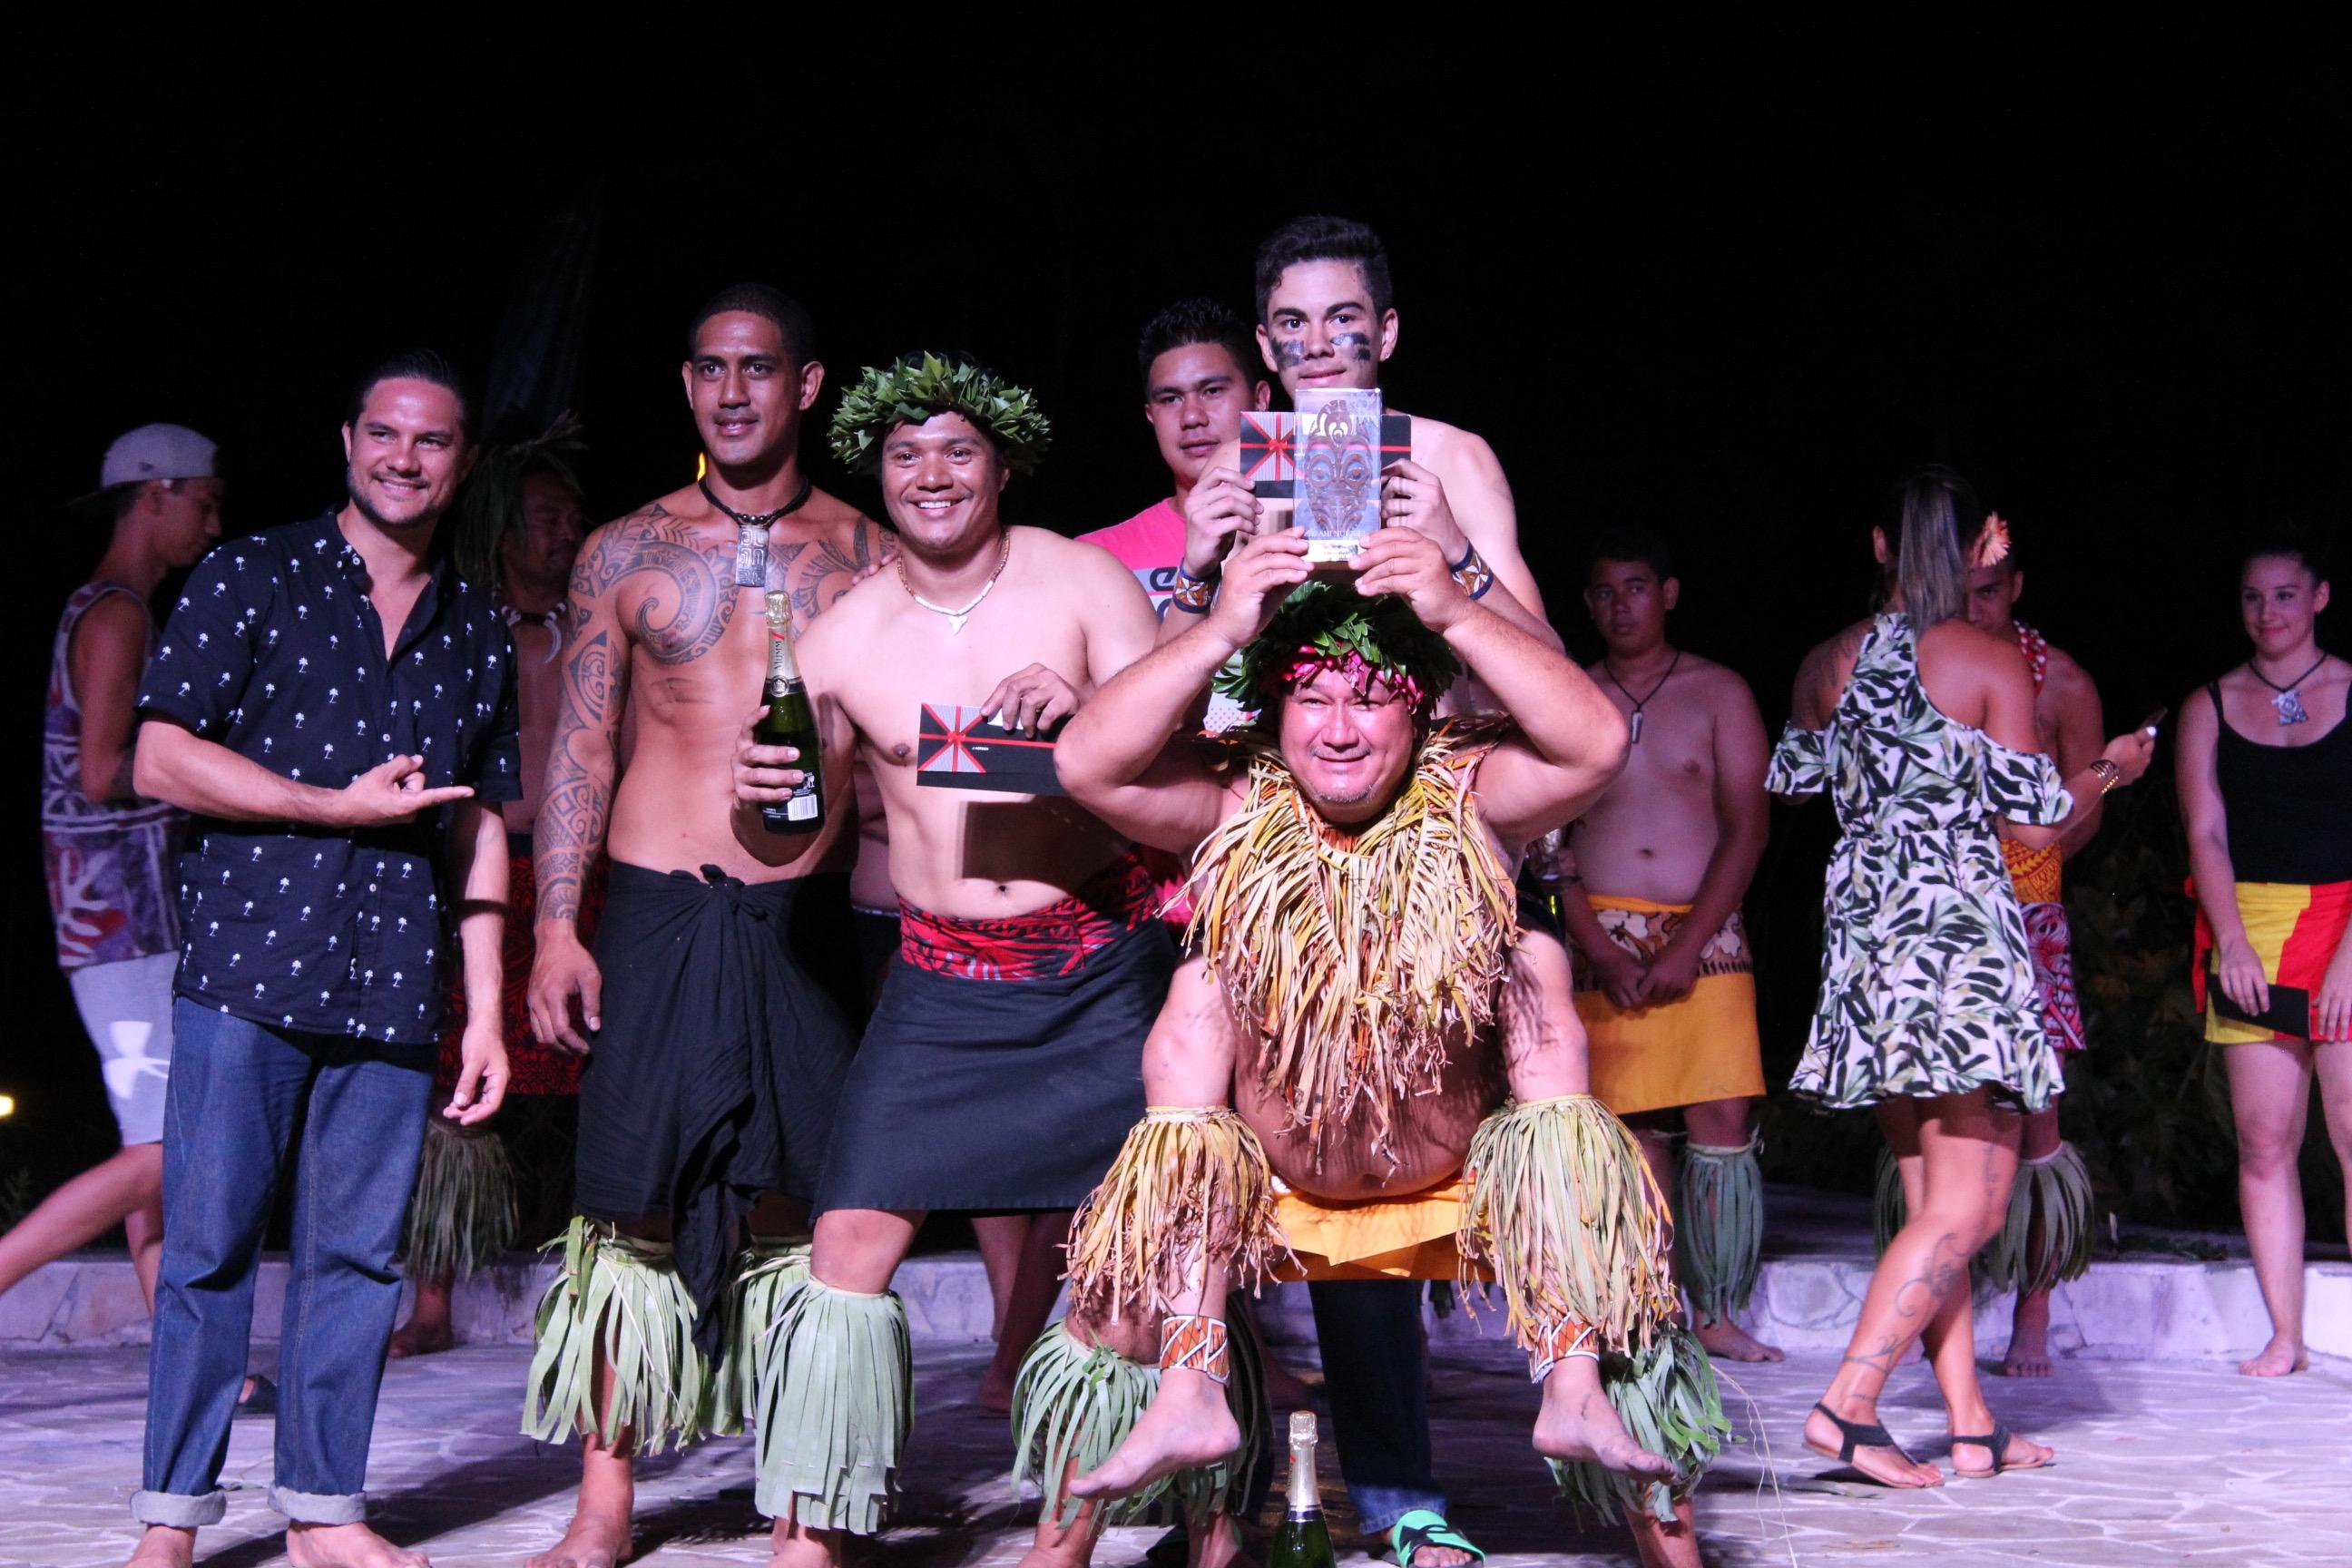 Danse du feu : Heimana Ondicolburry représentera la Polynésie à Hawaii